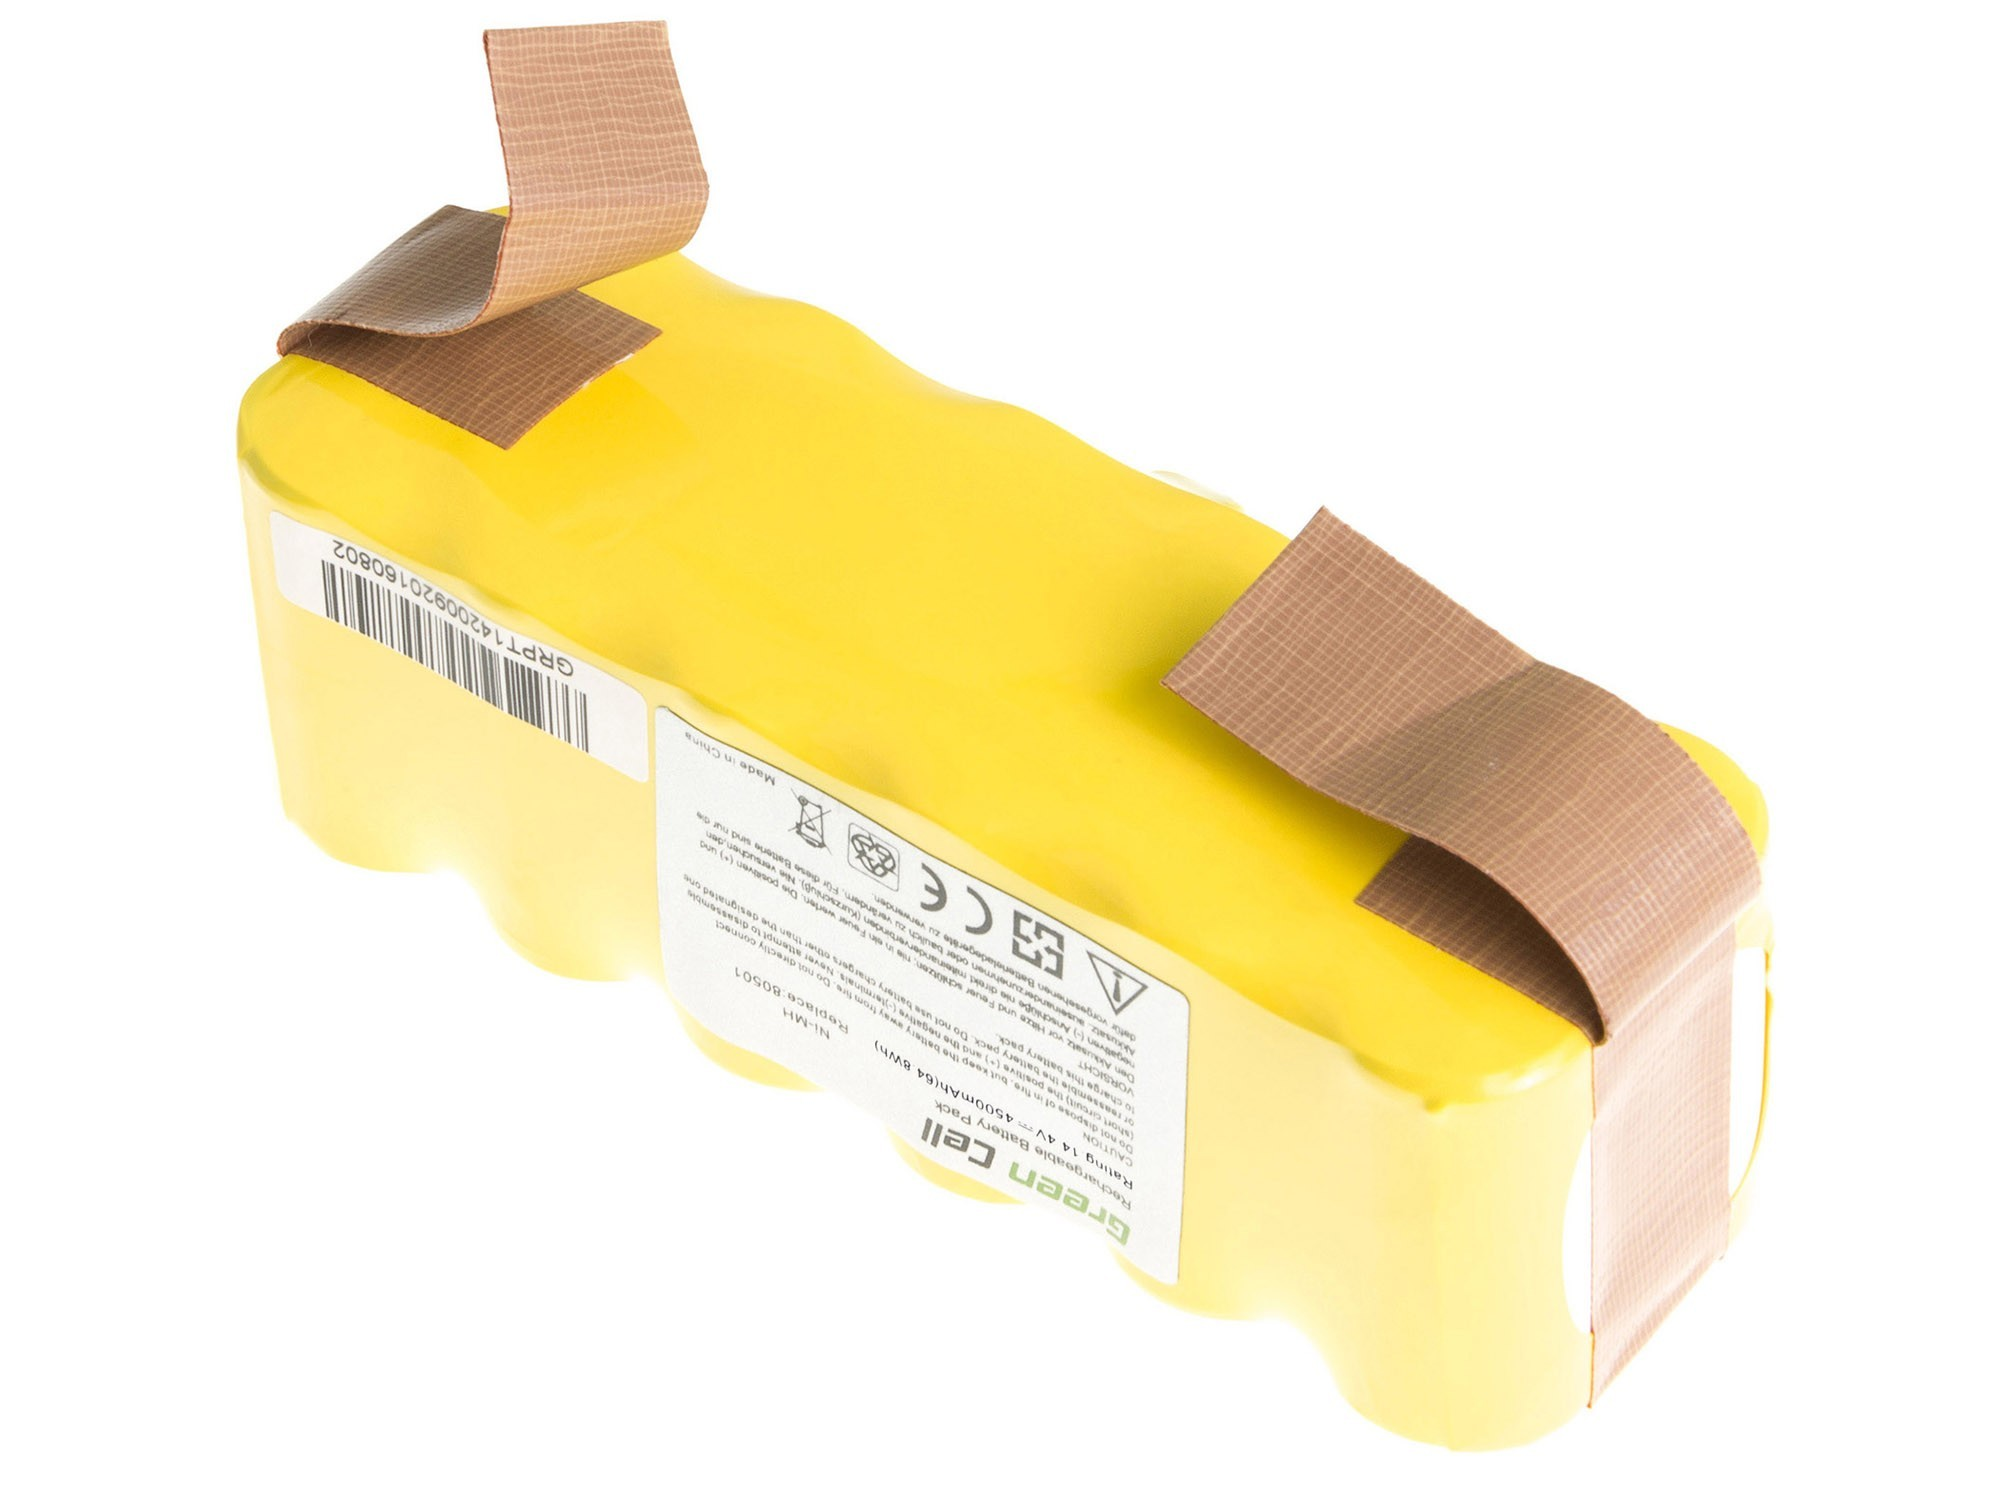 Green Cell Battery for iRobot Roomba 510 530 540 550 560 570 580 610 620 625 760 770 780 aksesuārs putekļsūcējam